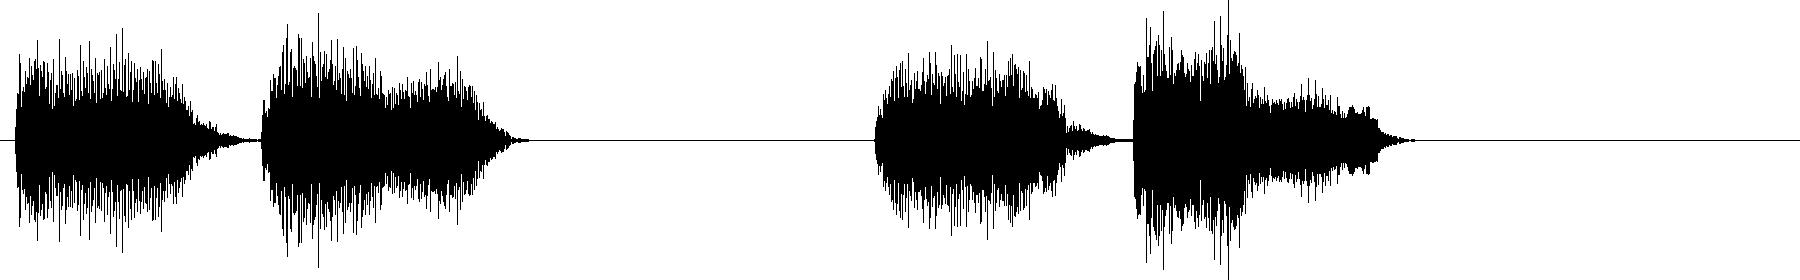 vocal fx   naming dubstep genre 140 bpm